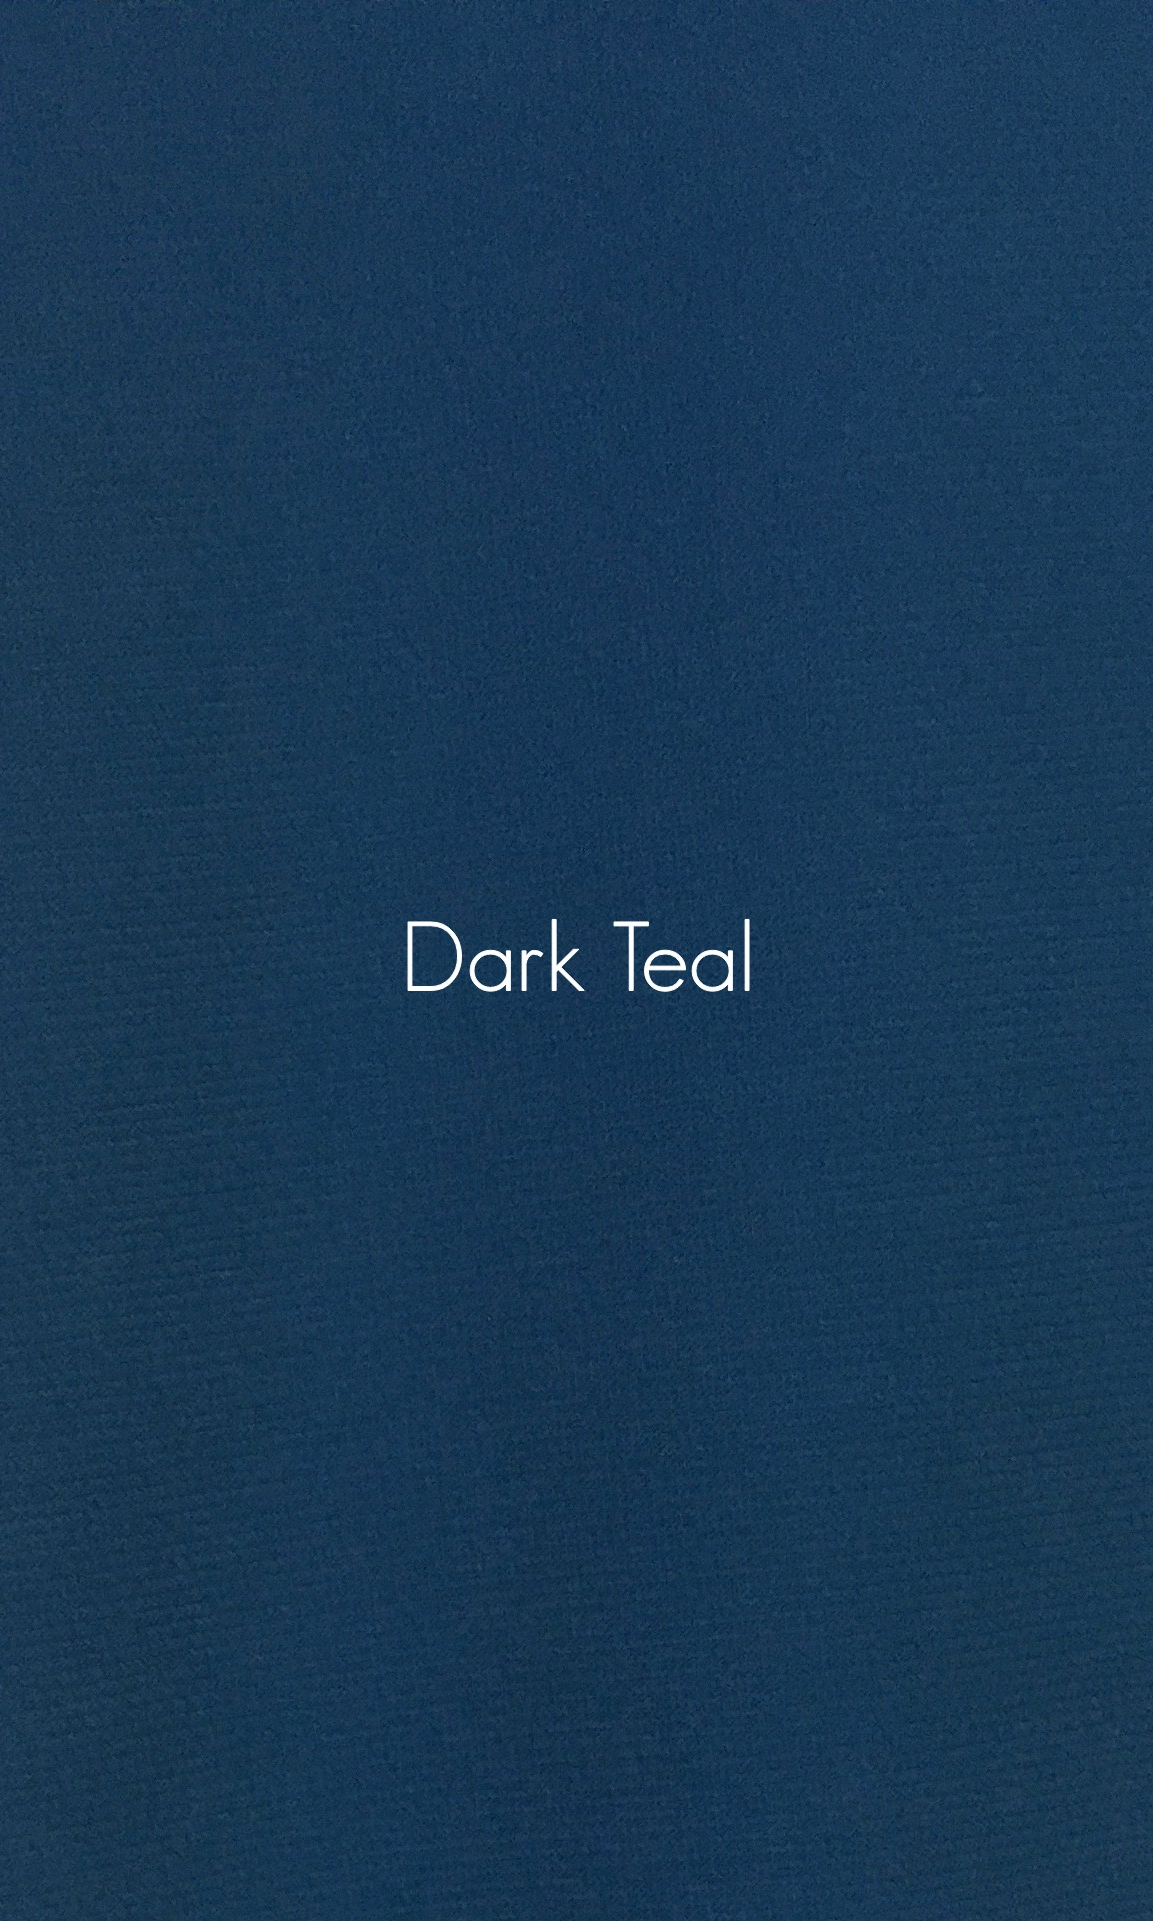 Dark Teal.jpg